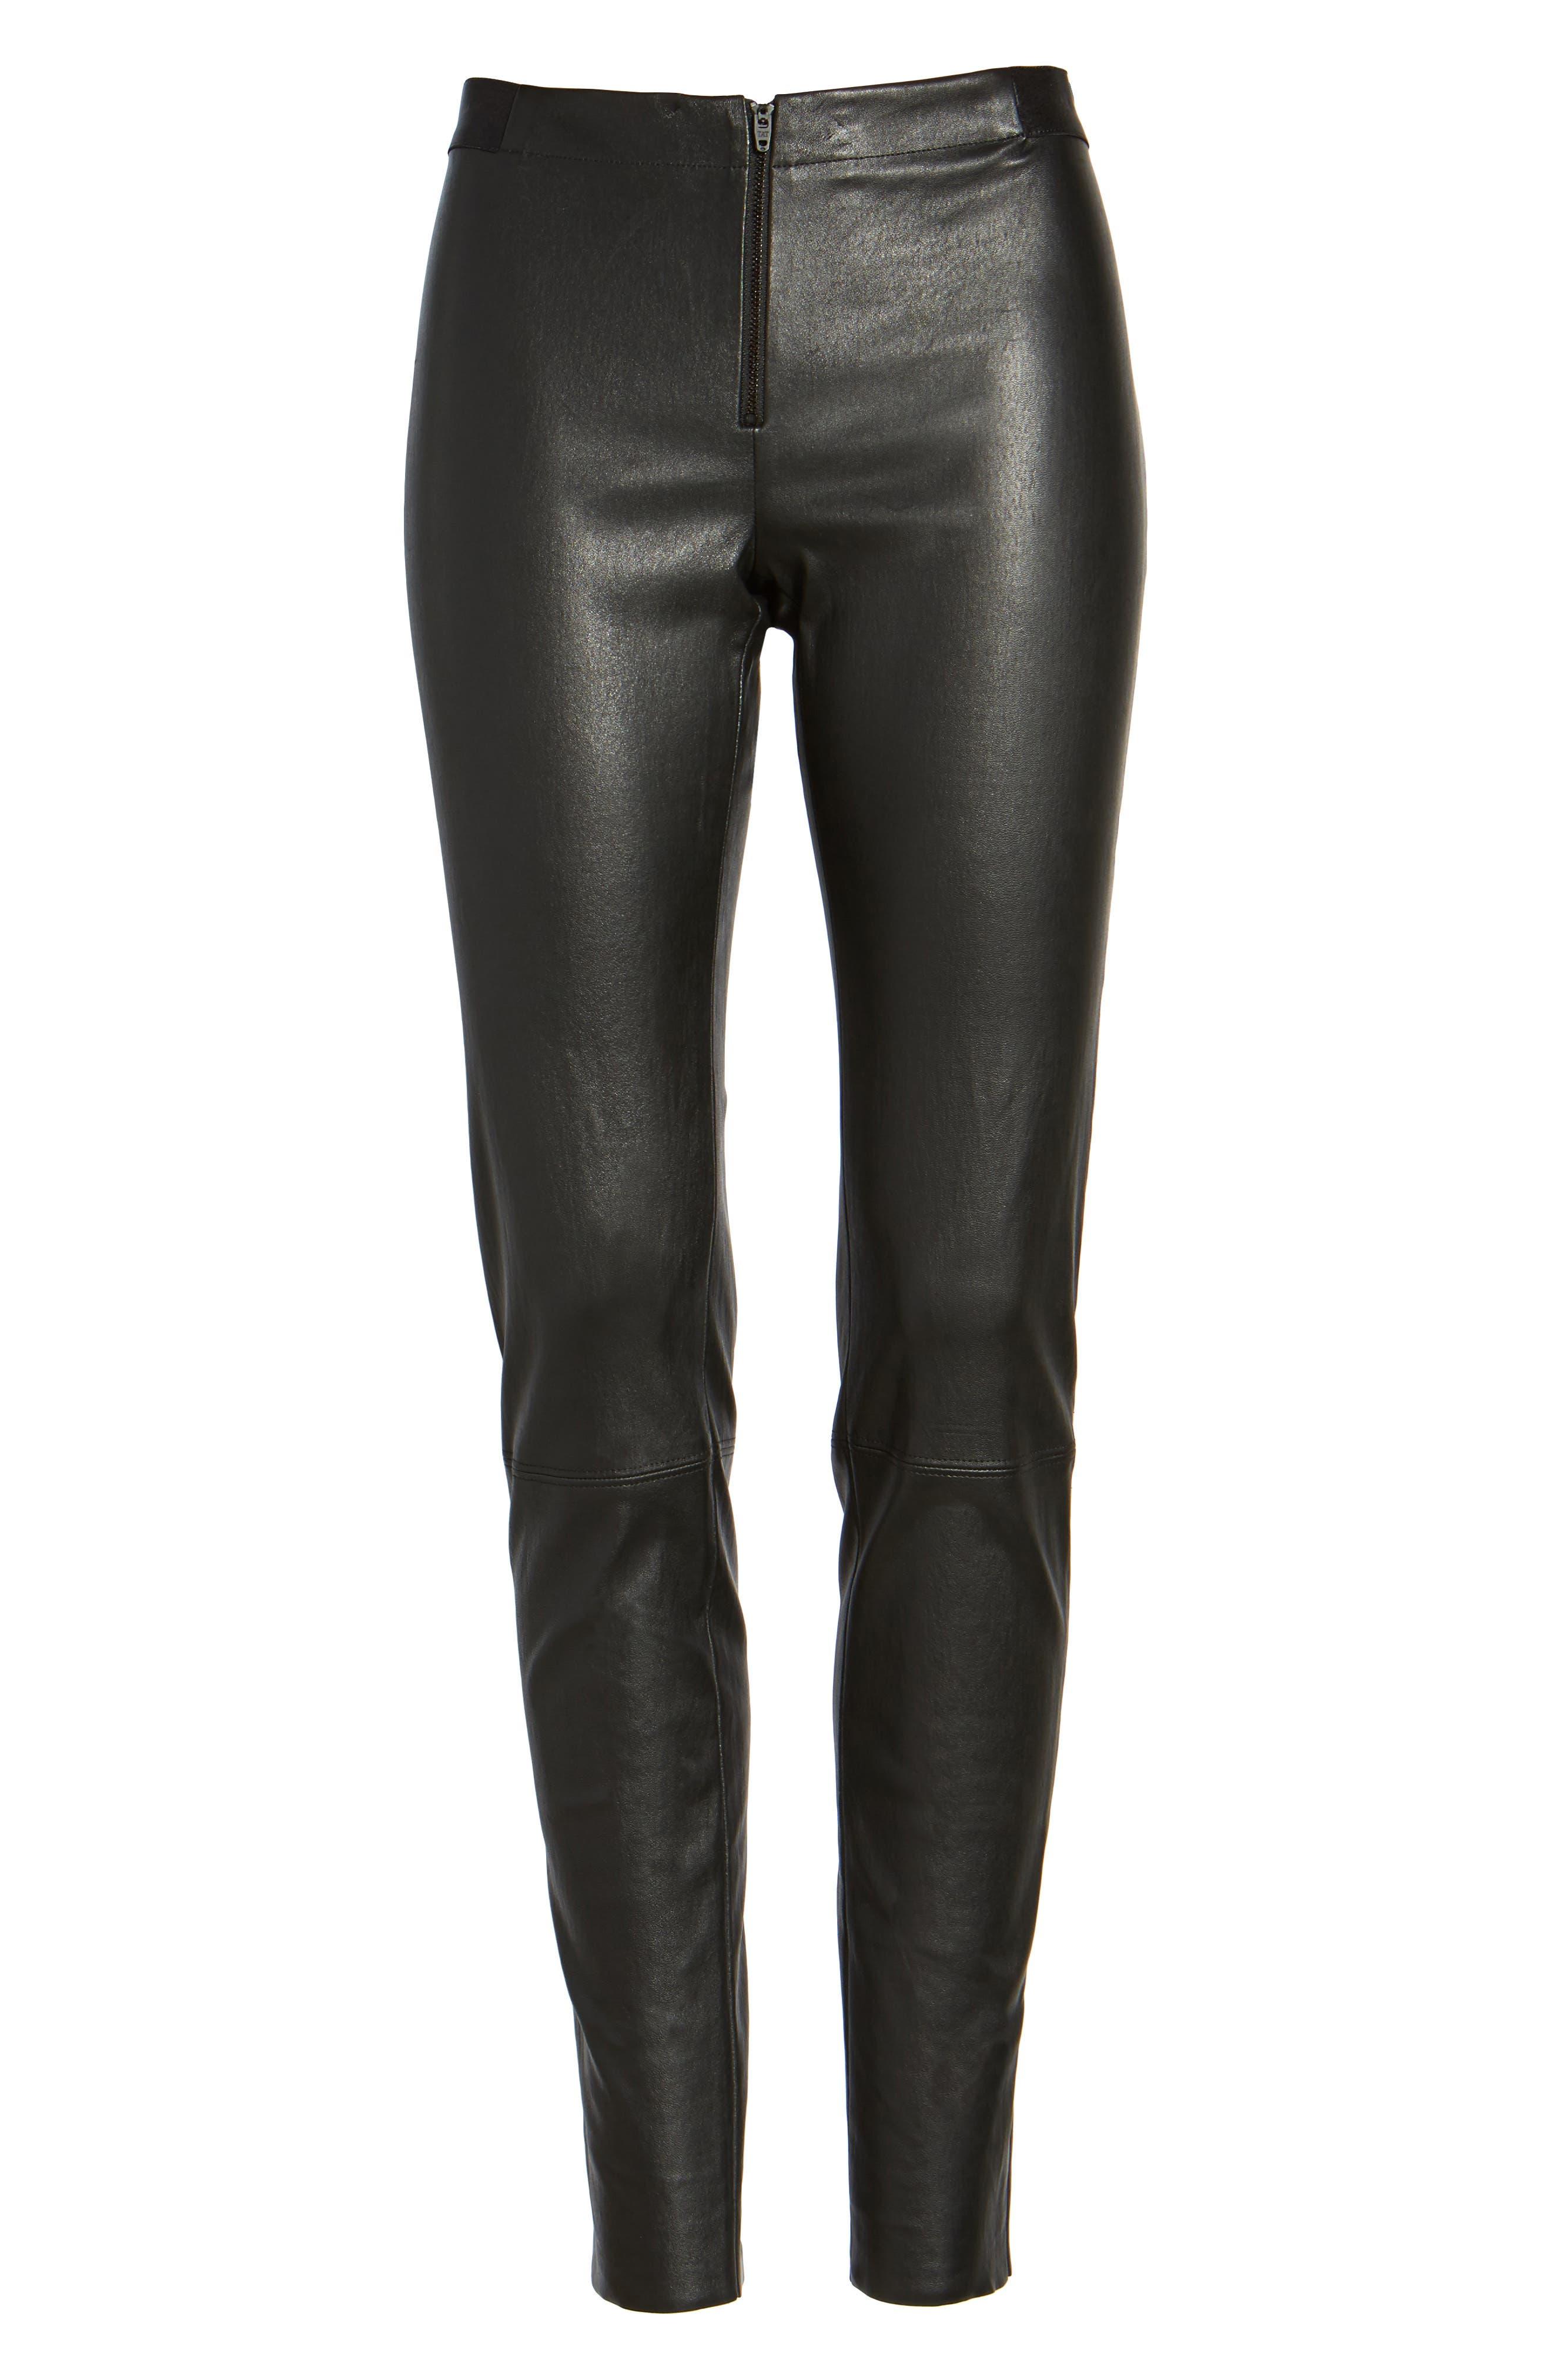 ALICE + OLIVIA, Leather Leggings, Alternate thumbnail 7, color, BLACK